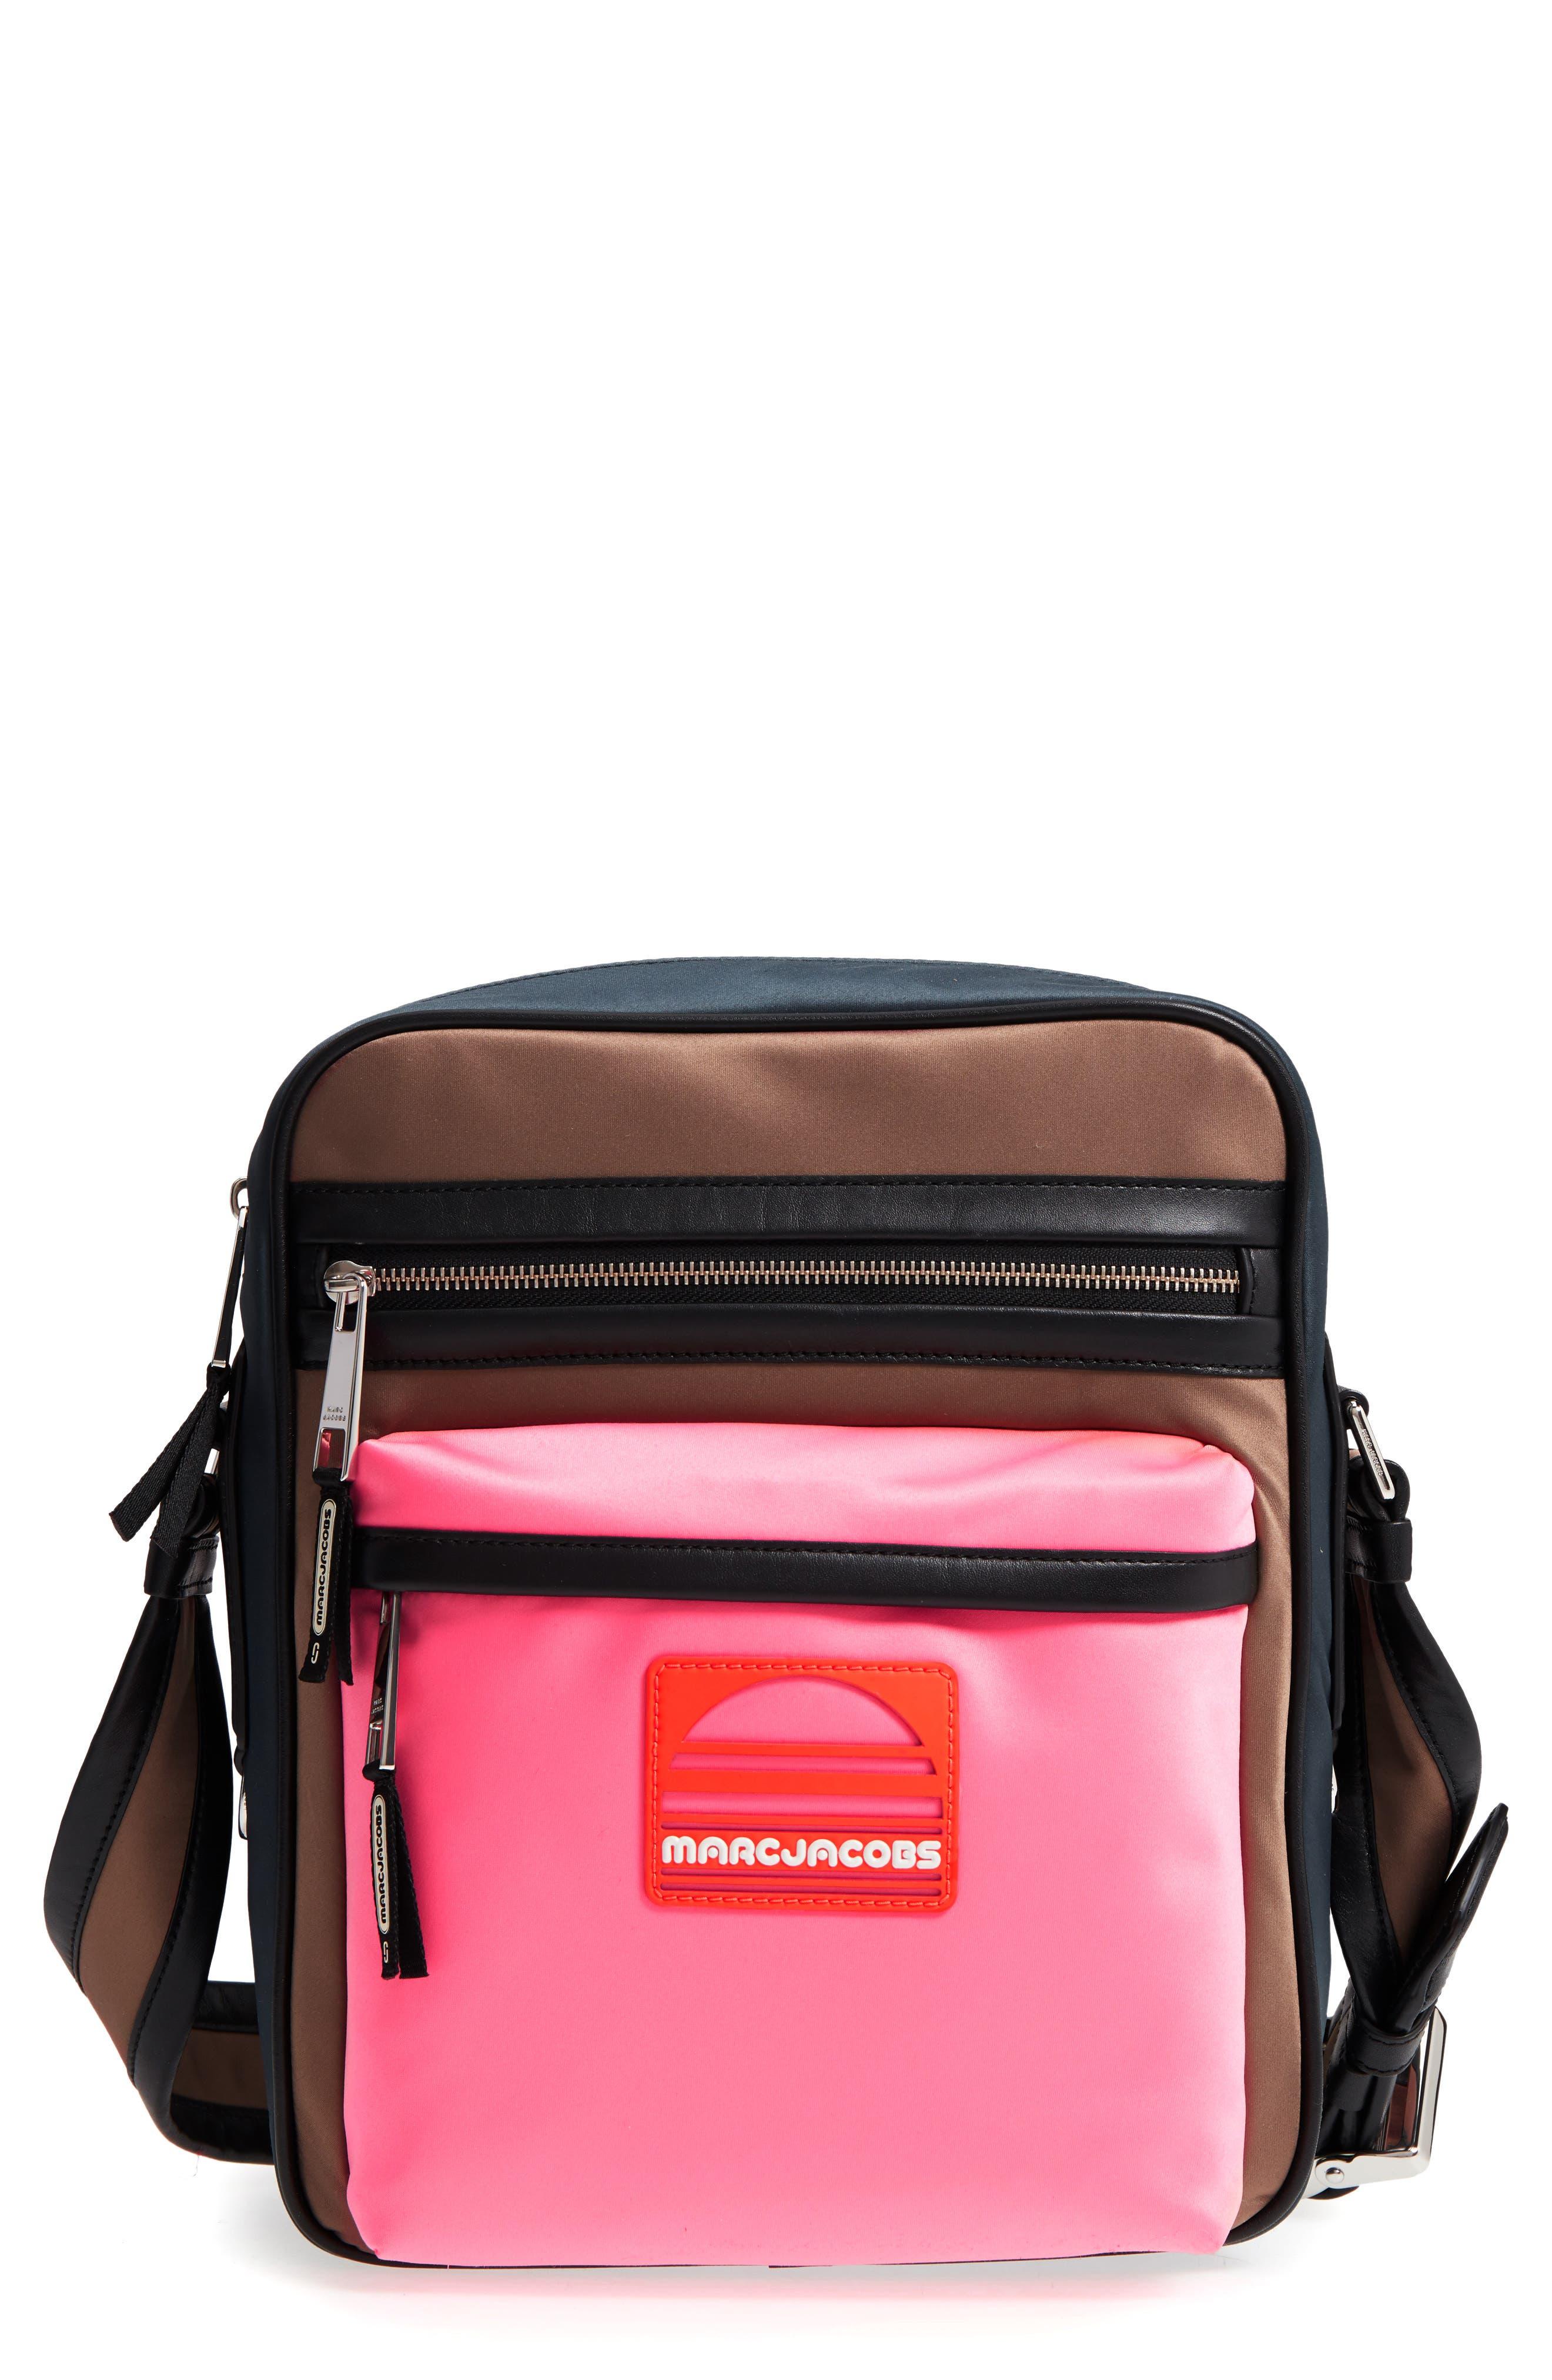 MARC JACOBS Sport Crossbody Bag